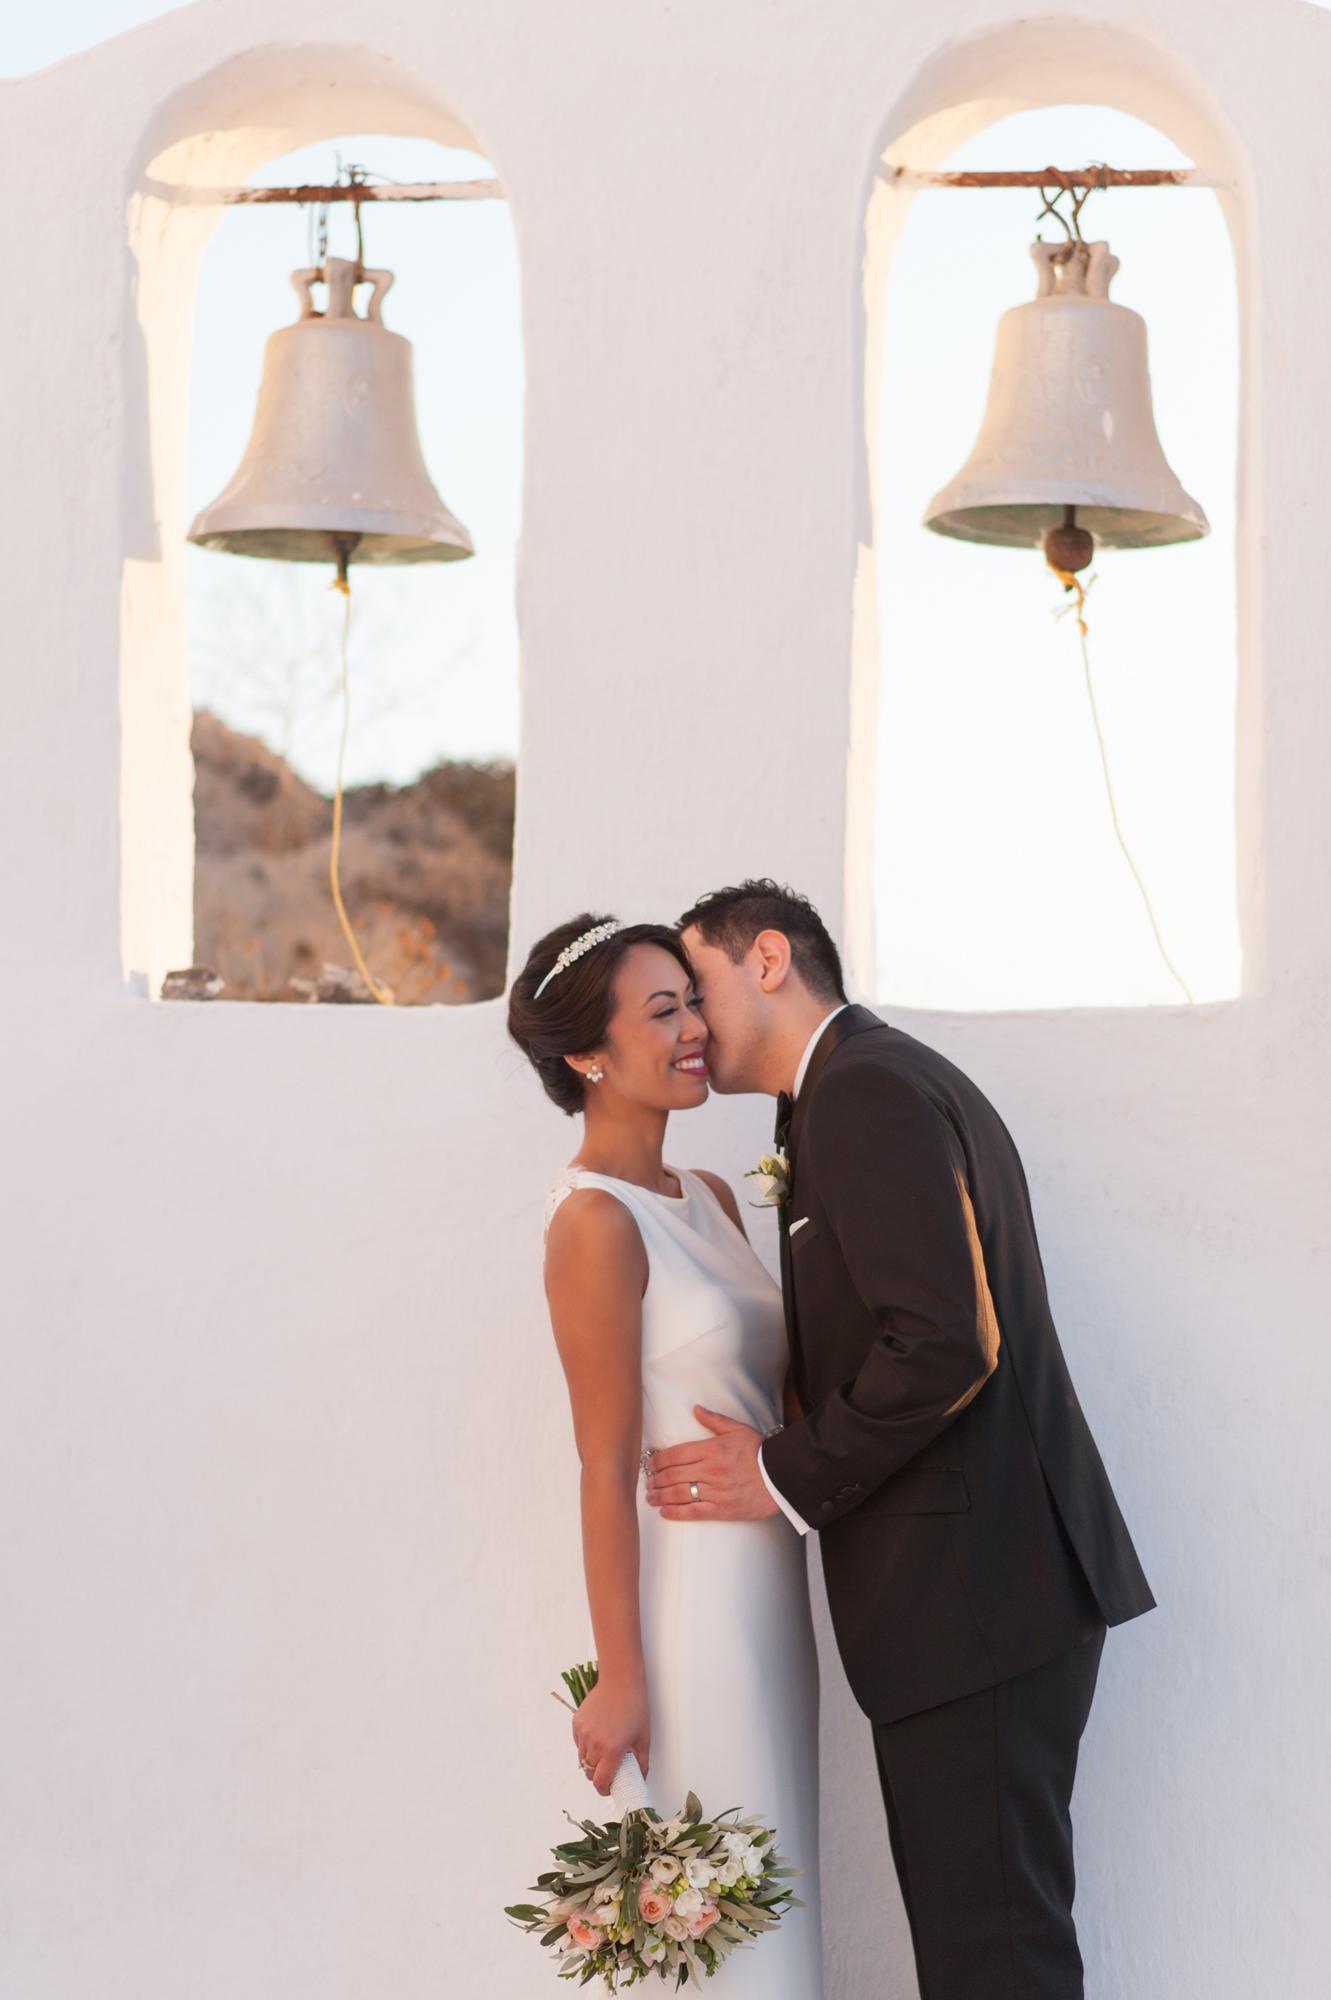 large wedding bell decor at wedding venue